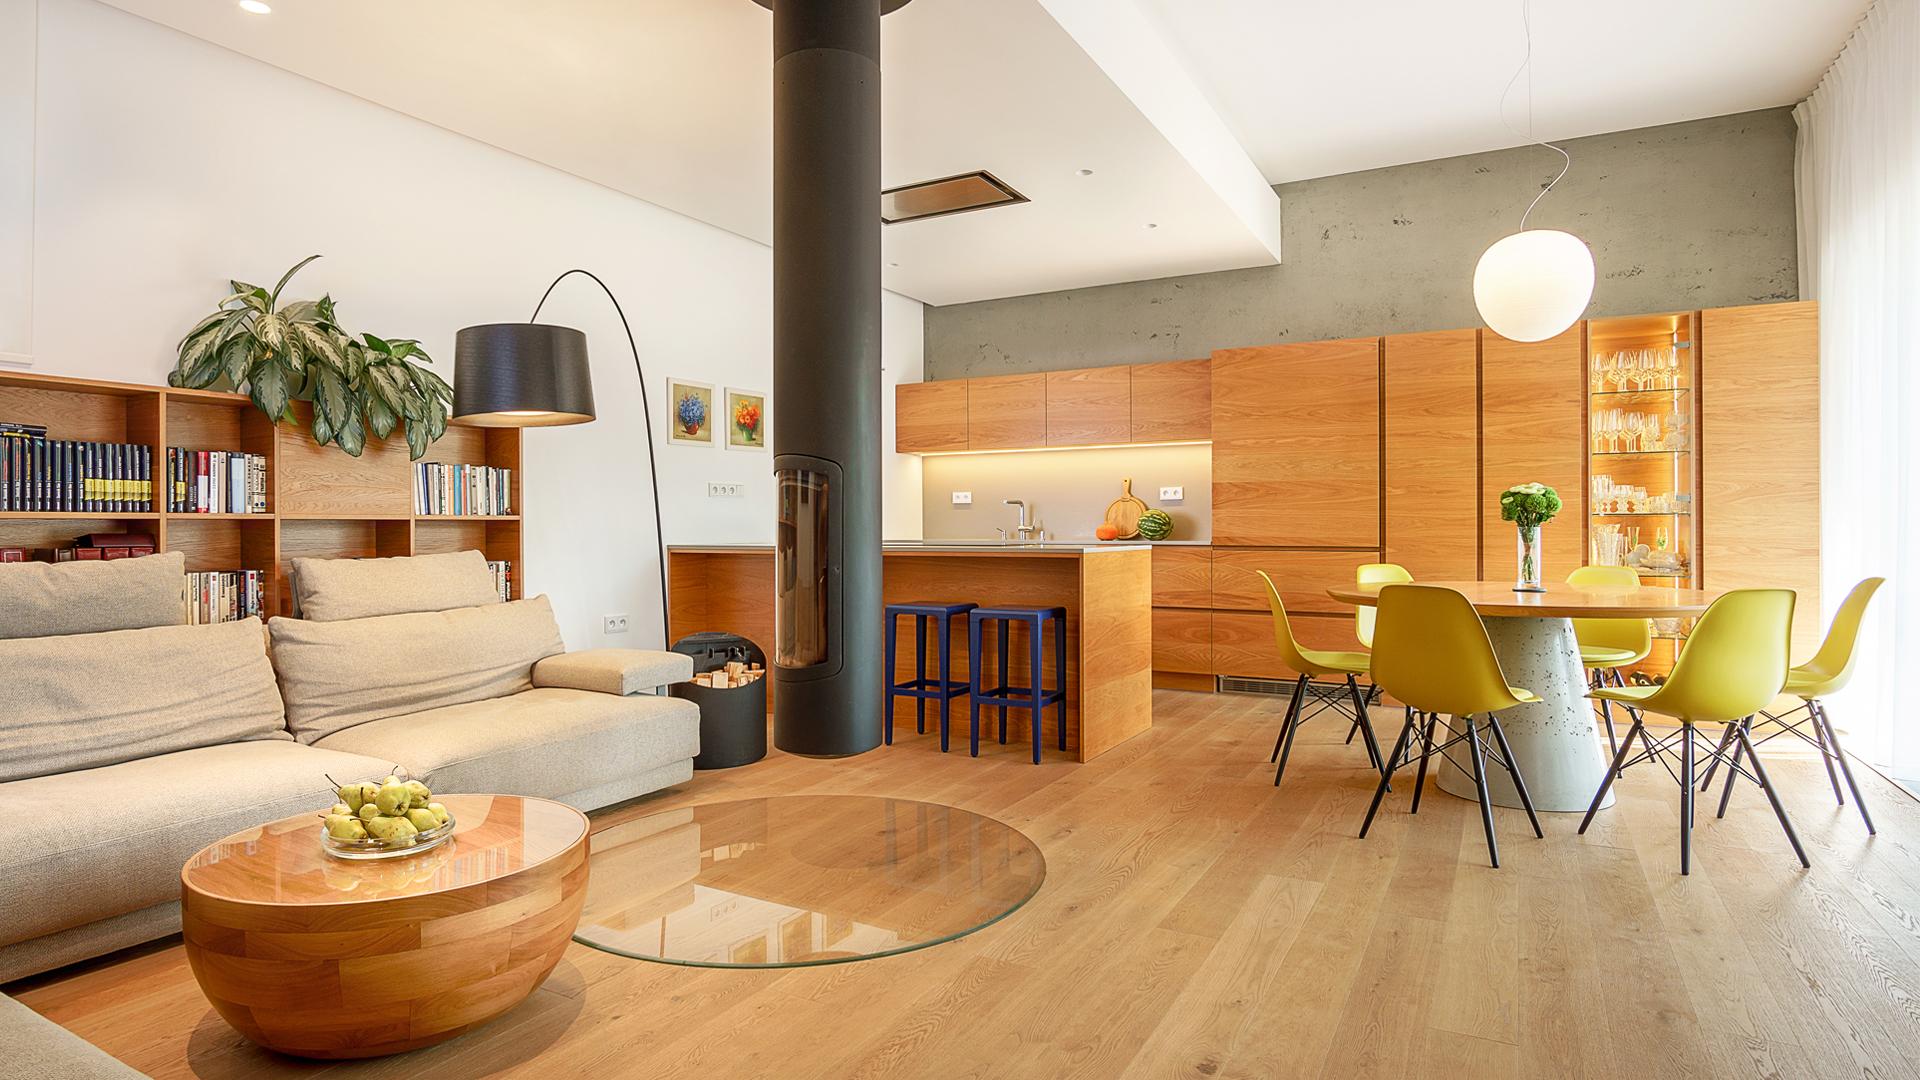 navrh interieru domu, zelene terasy, devin, interier domu, navrh jedalne, navrh kuchyne, navrh interieru kuchyne, navrh interieru, dizajn interieru, interierovy dizajner, interierovy dizajn, foscarini, focus fireplace, dining room, kitchen design, interior design,vitra chair, interior designer , prirodny dub, dubova dyha,